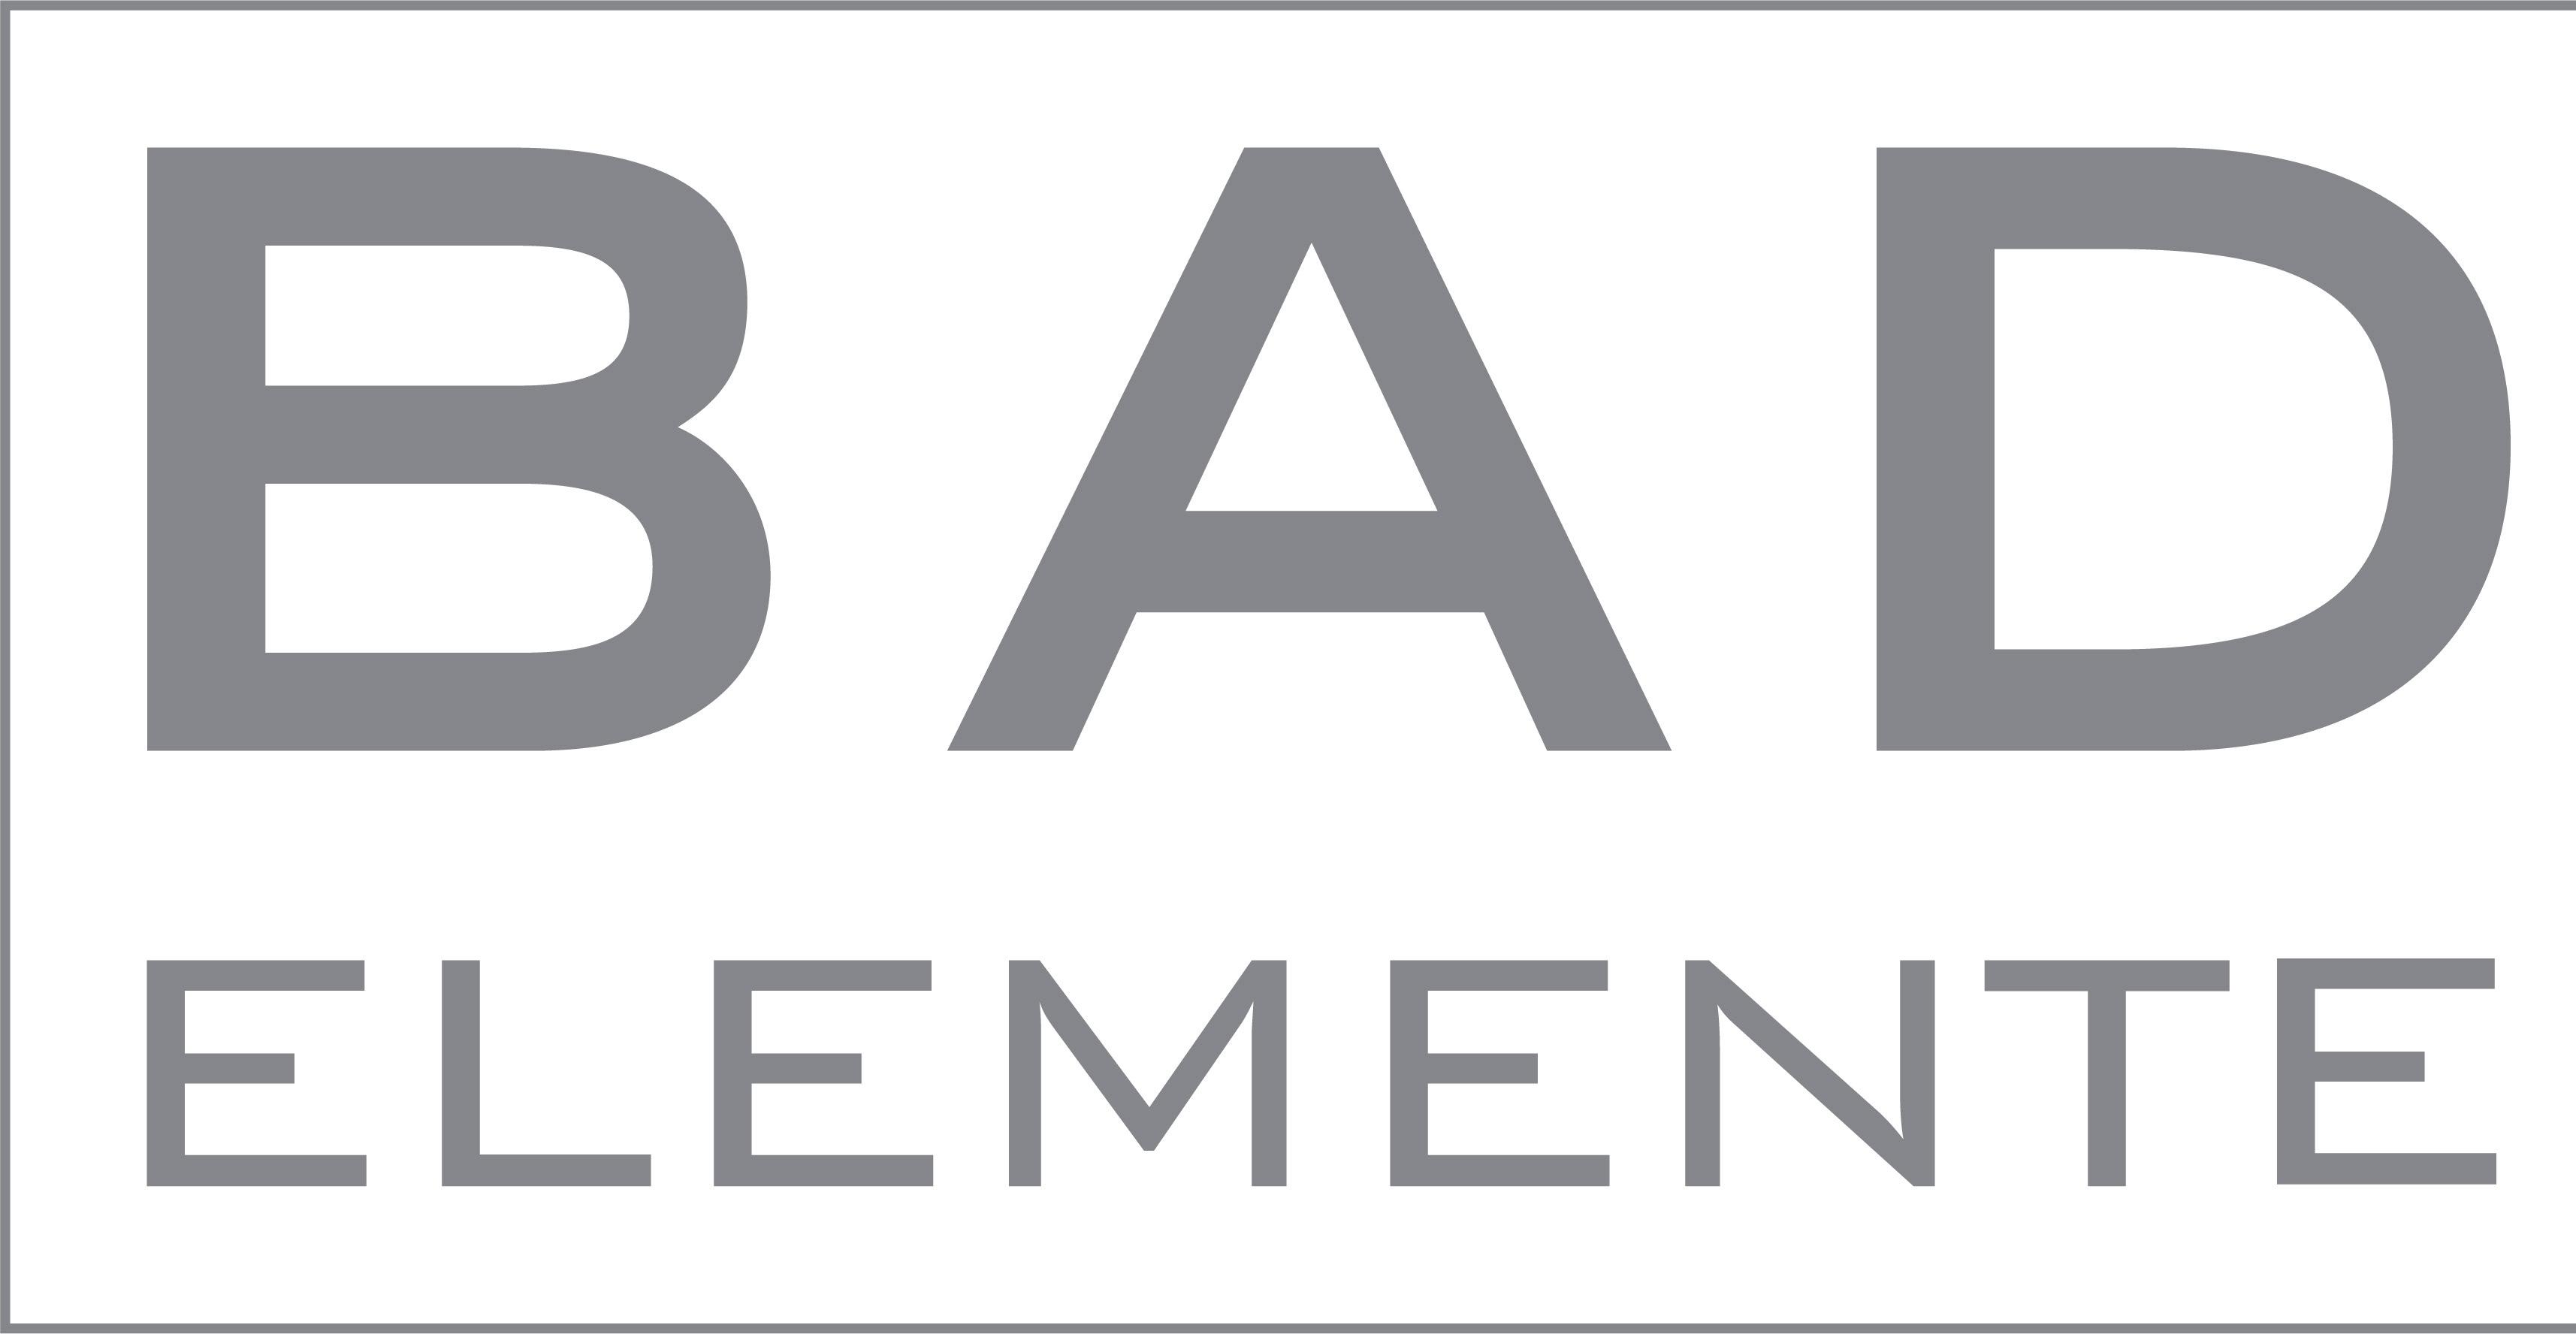 BAD ELEMENTE Logo